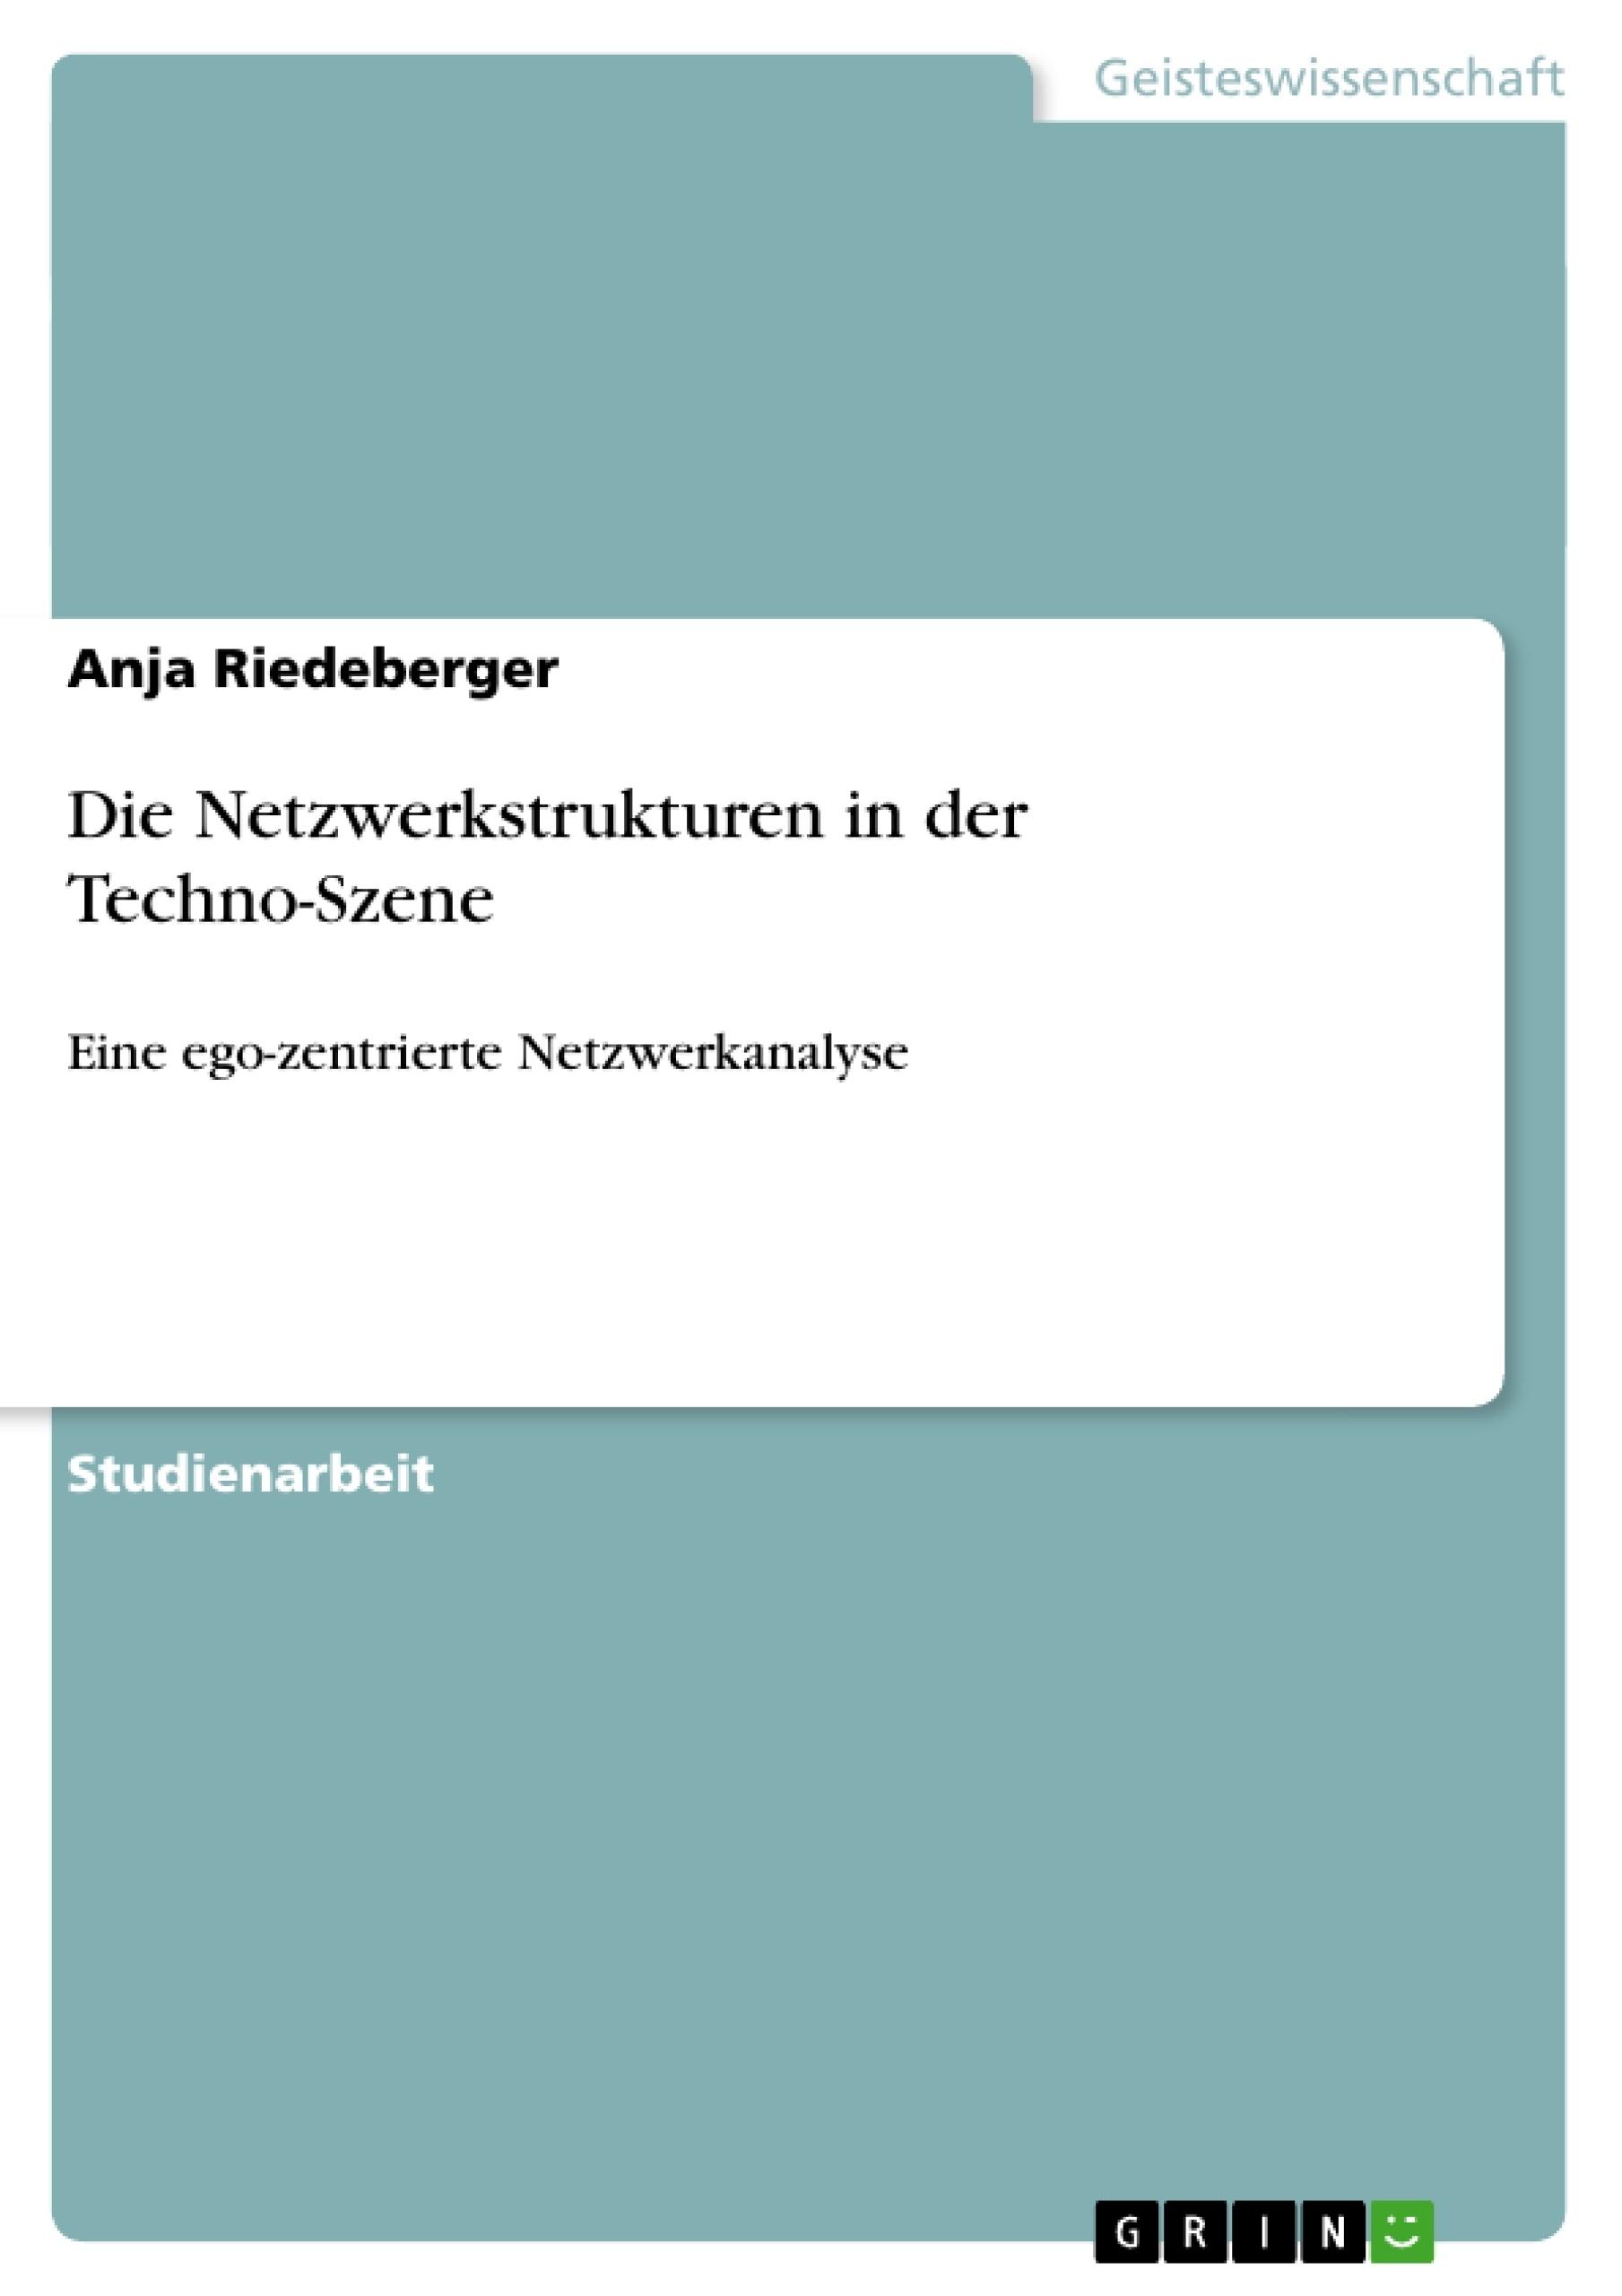 Titel: Die Netzwerkstrukturen in der Techno-Szene